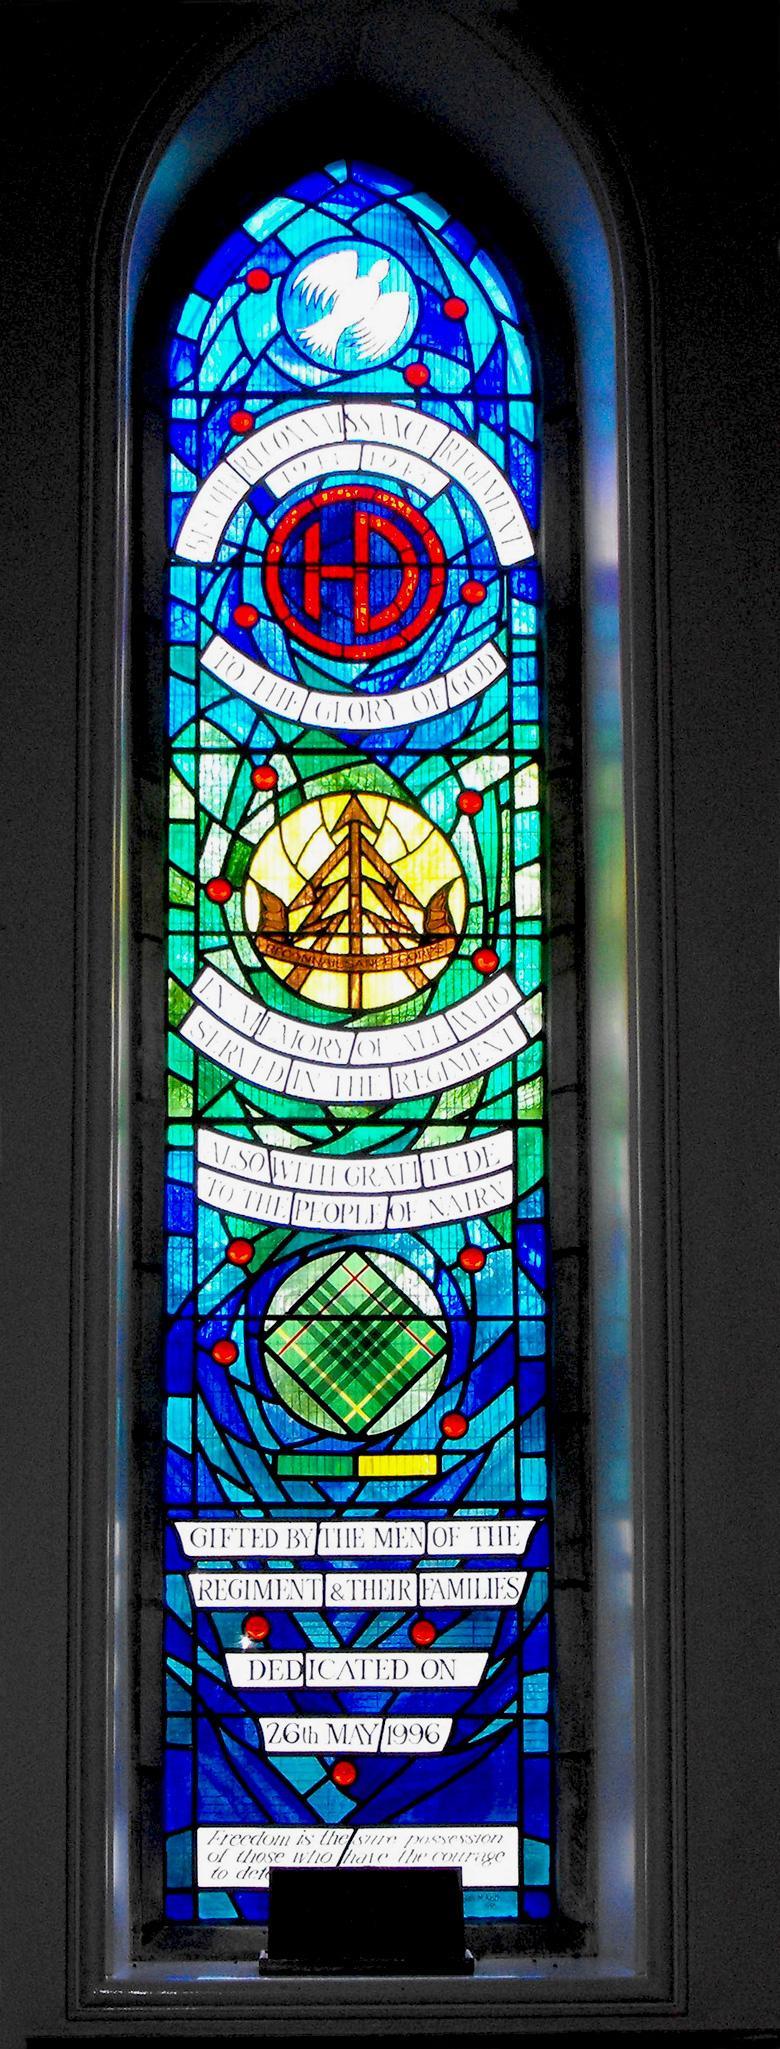 51 (H) Recce Reg Memorial Window